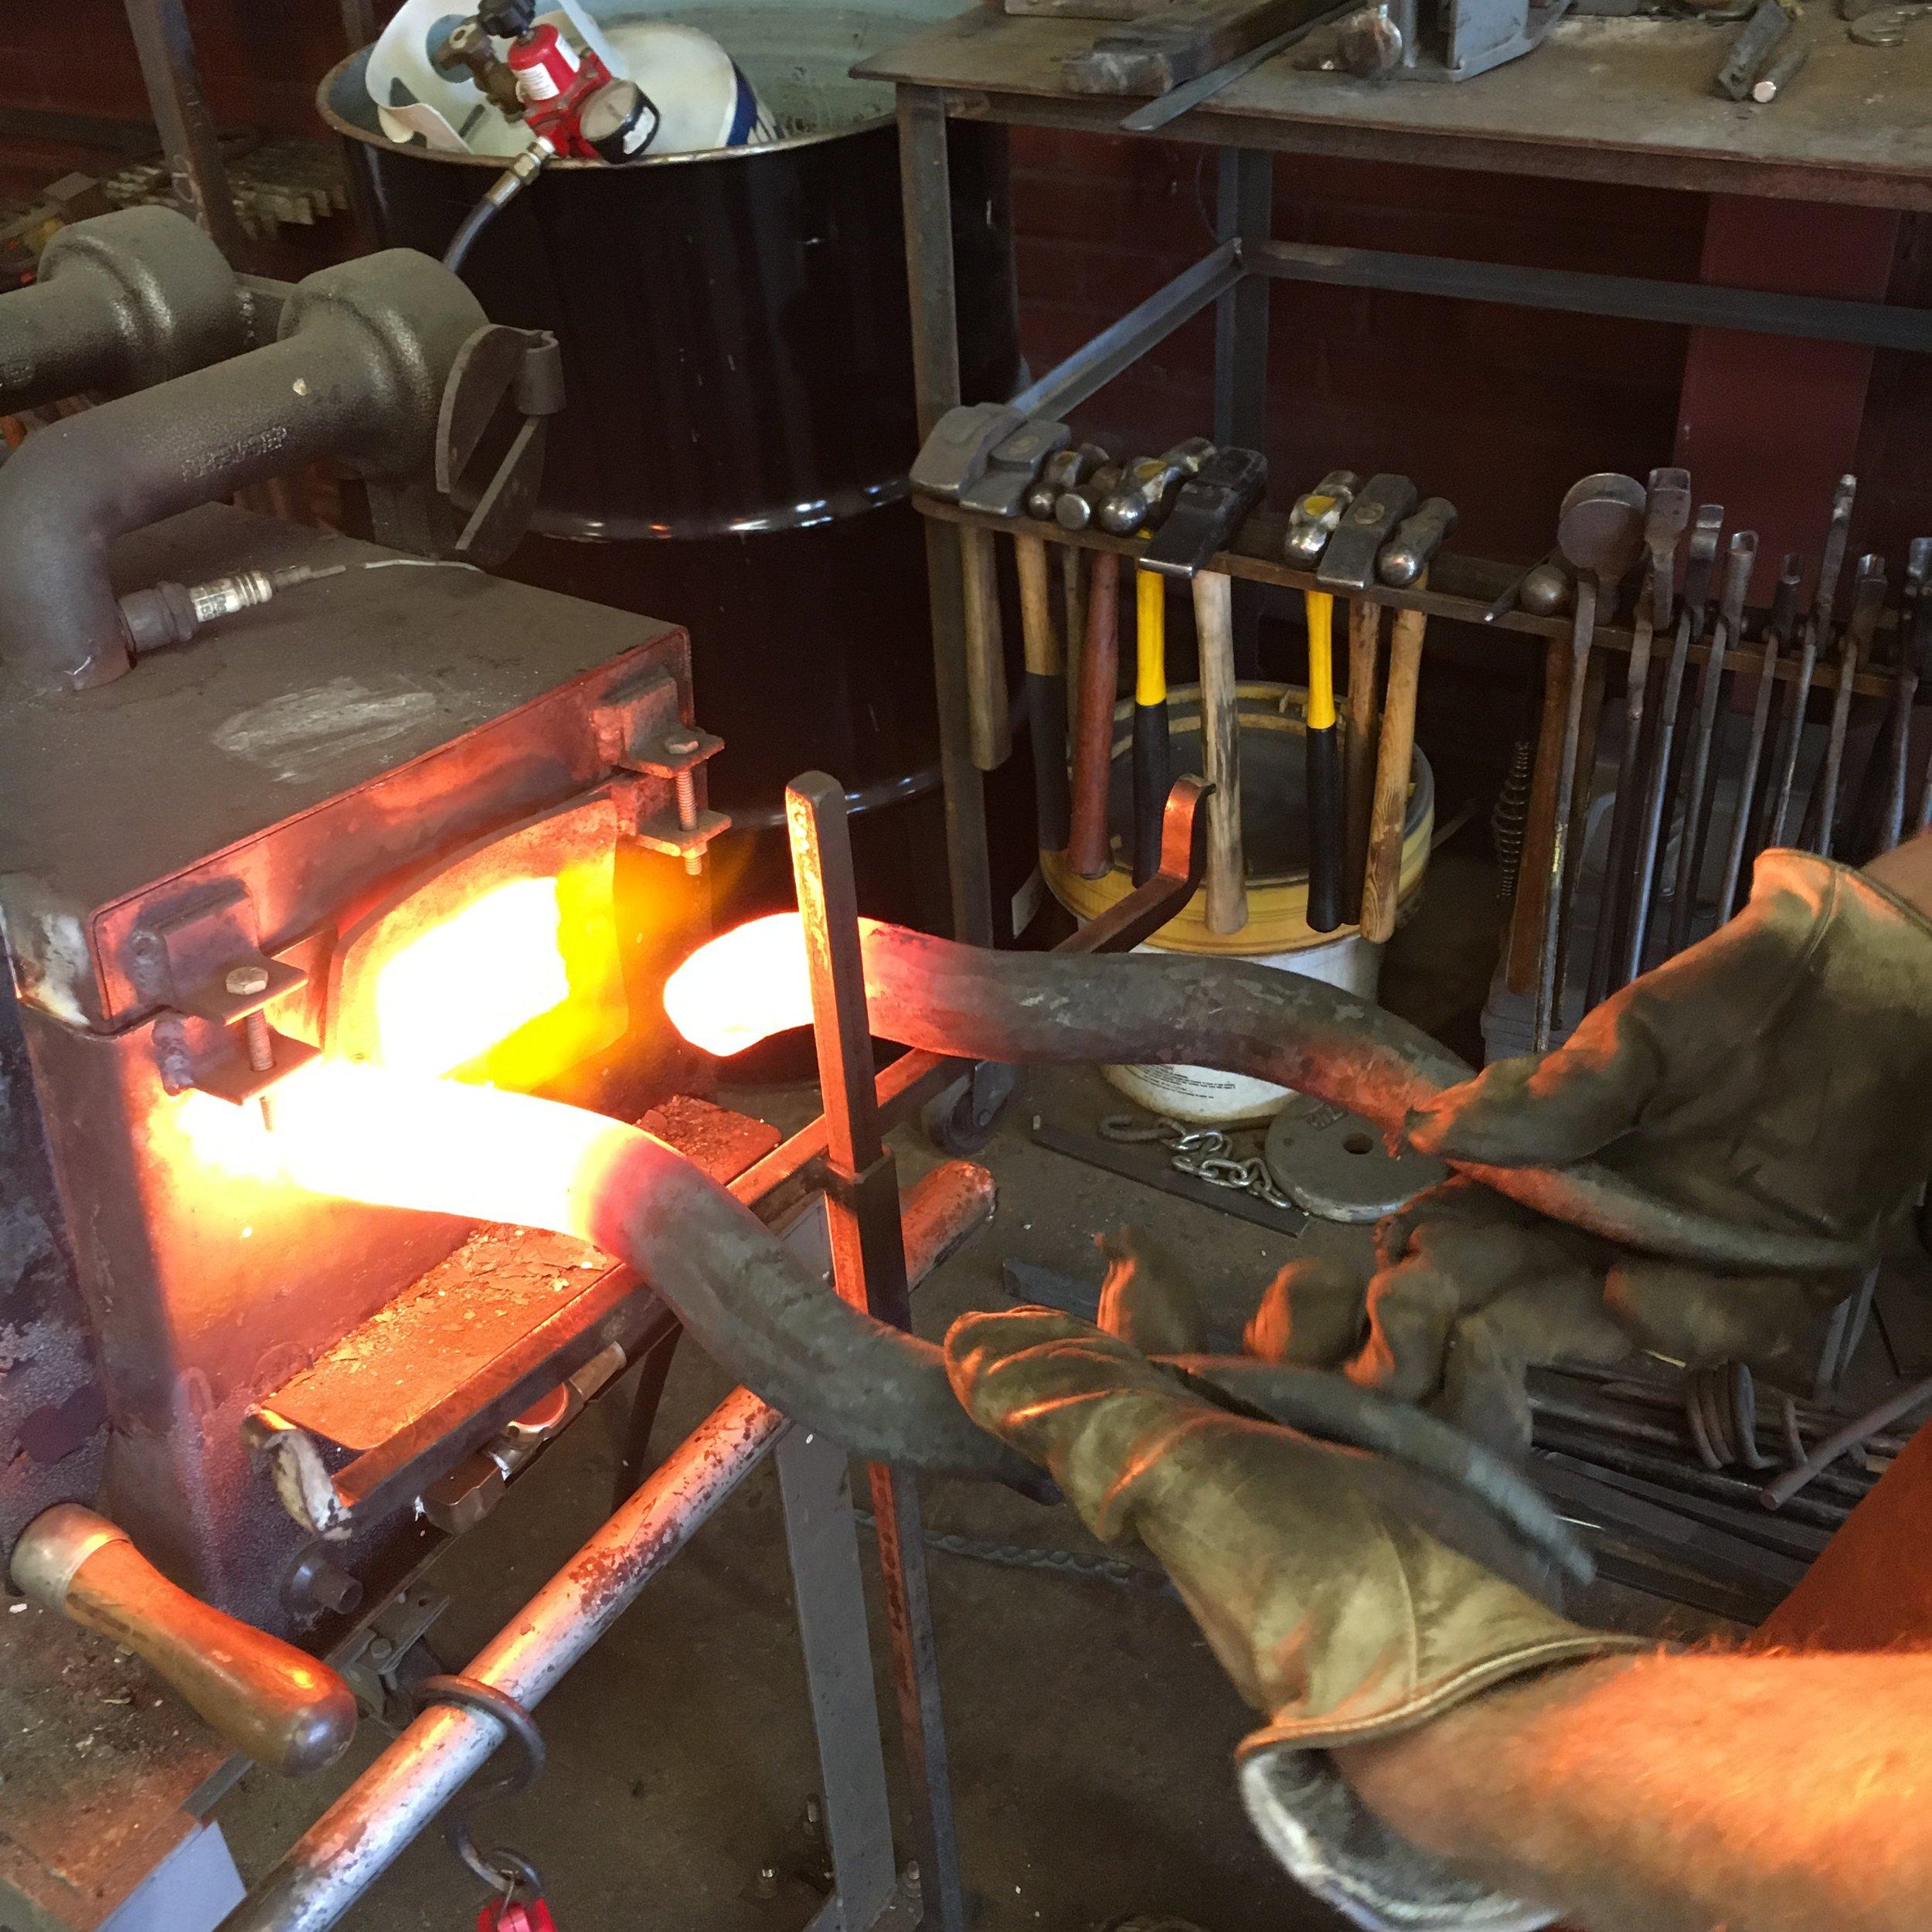 Heating door handles in the gas forge